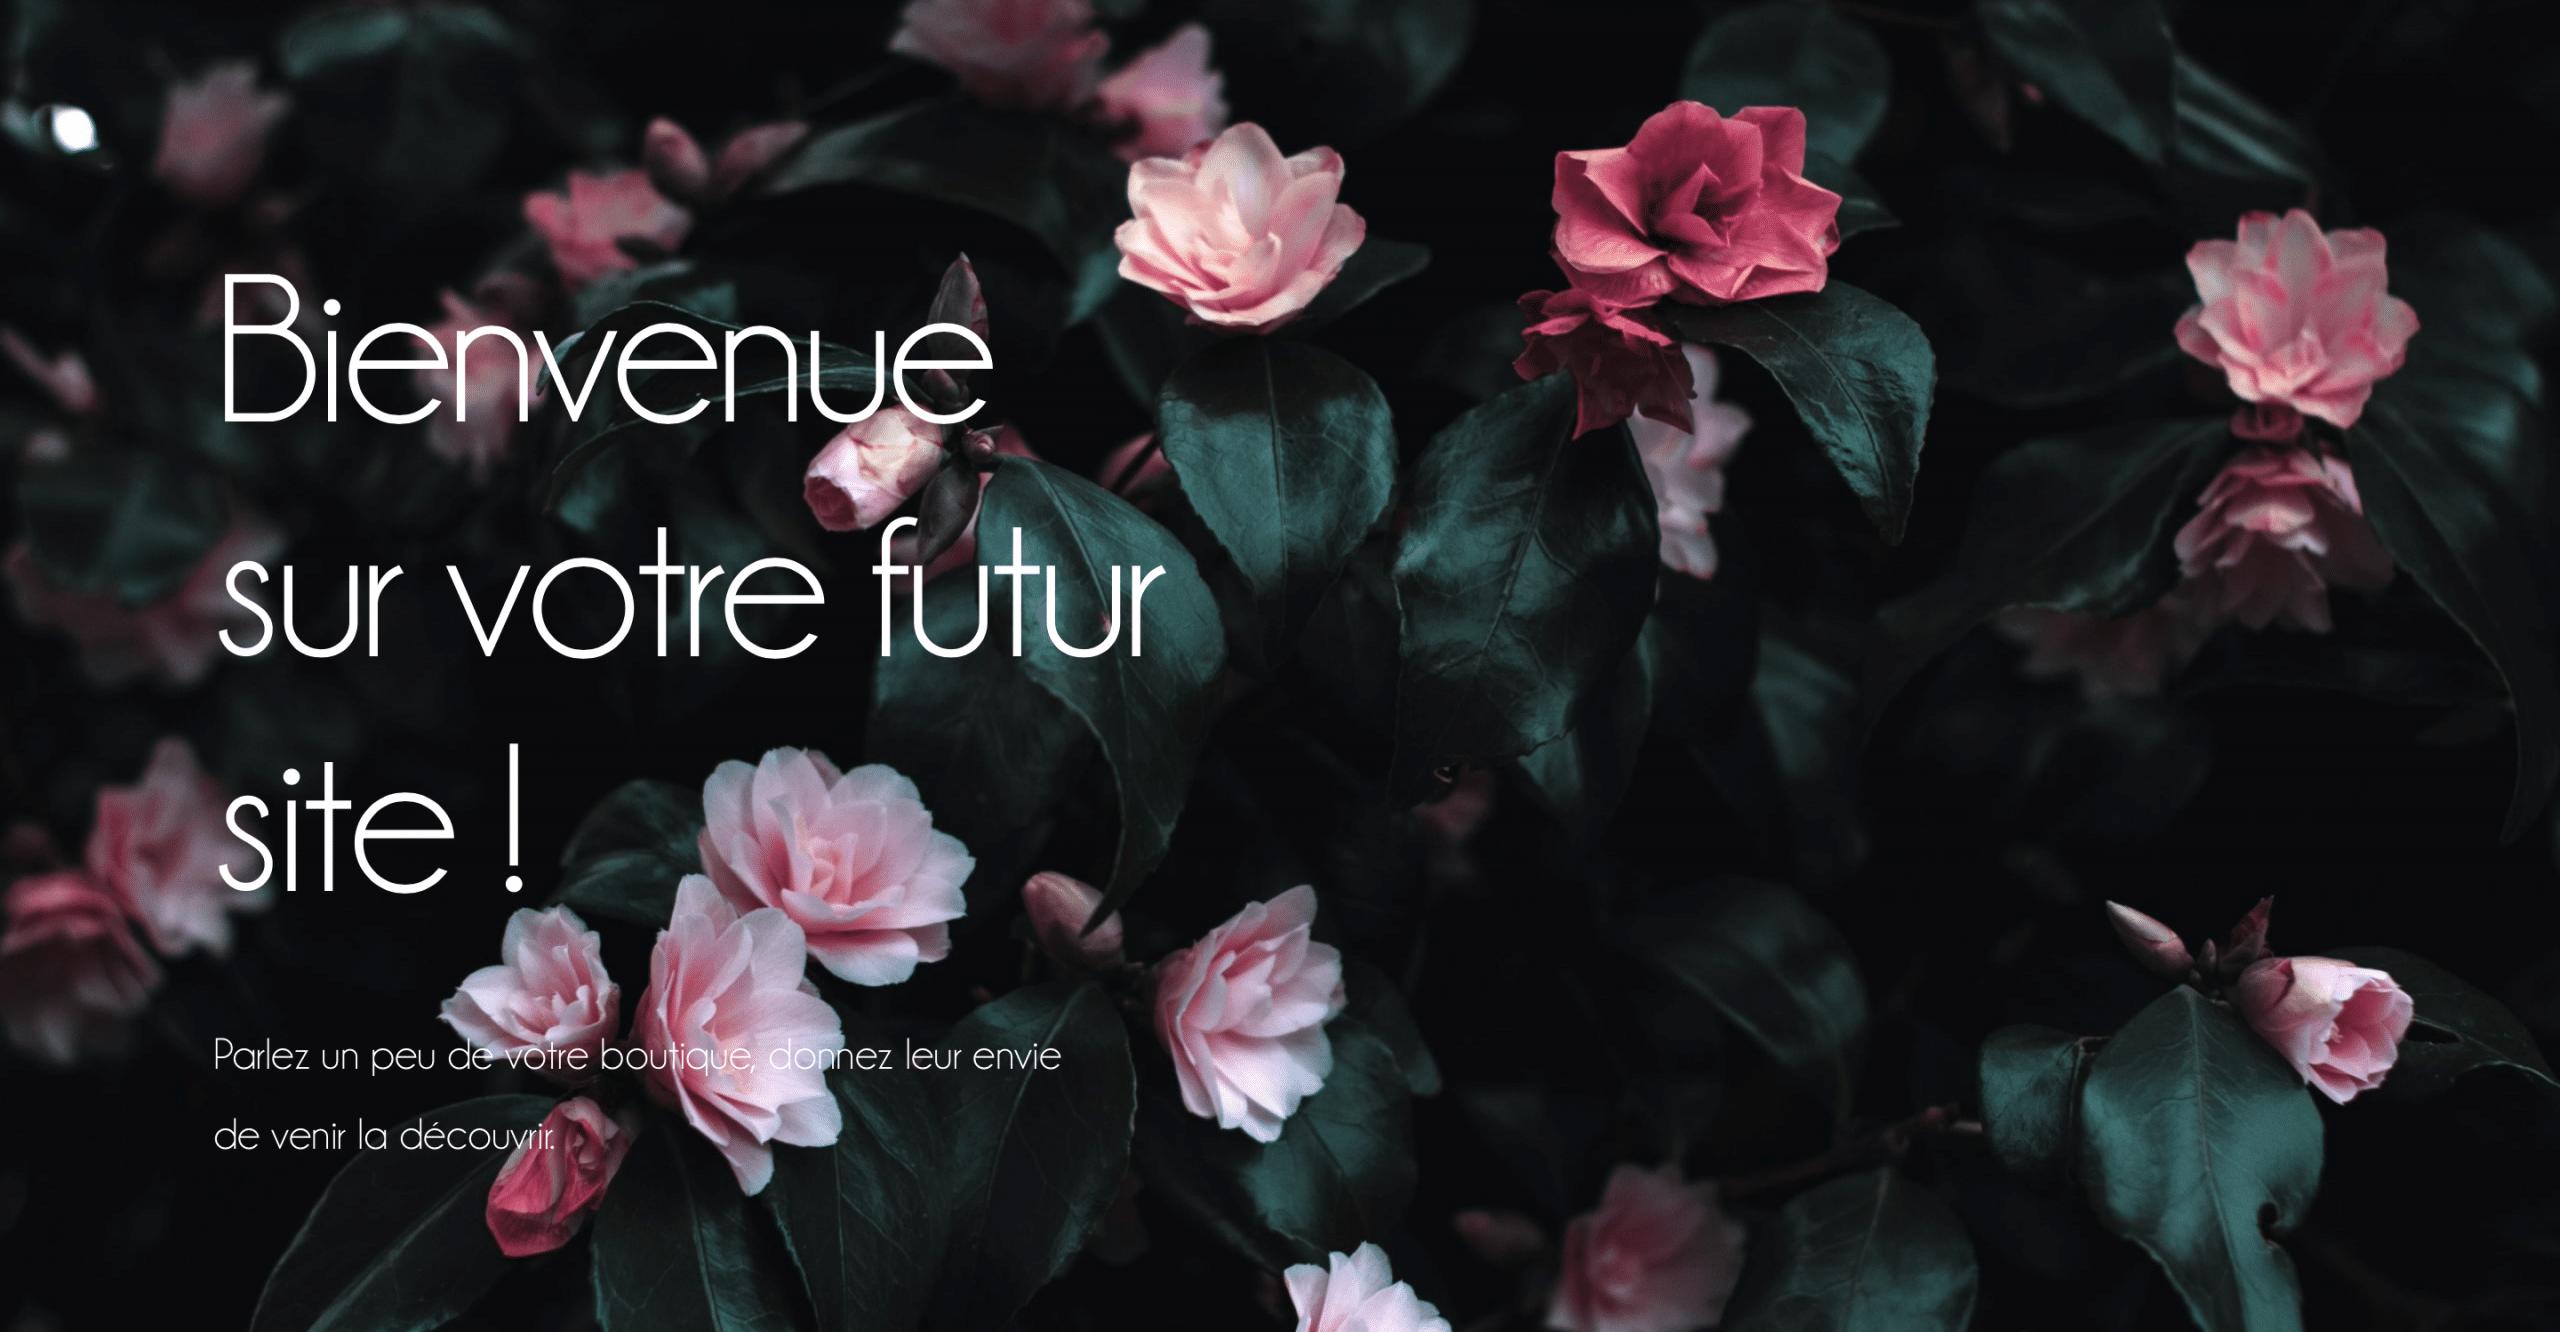 Plug and Pulse - Fleuriste - Bannière du site de fleuriste